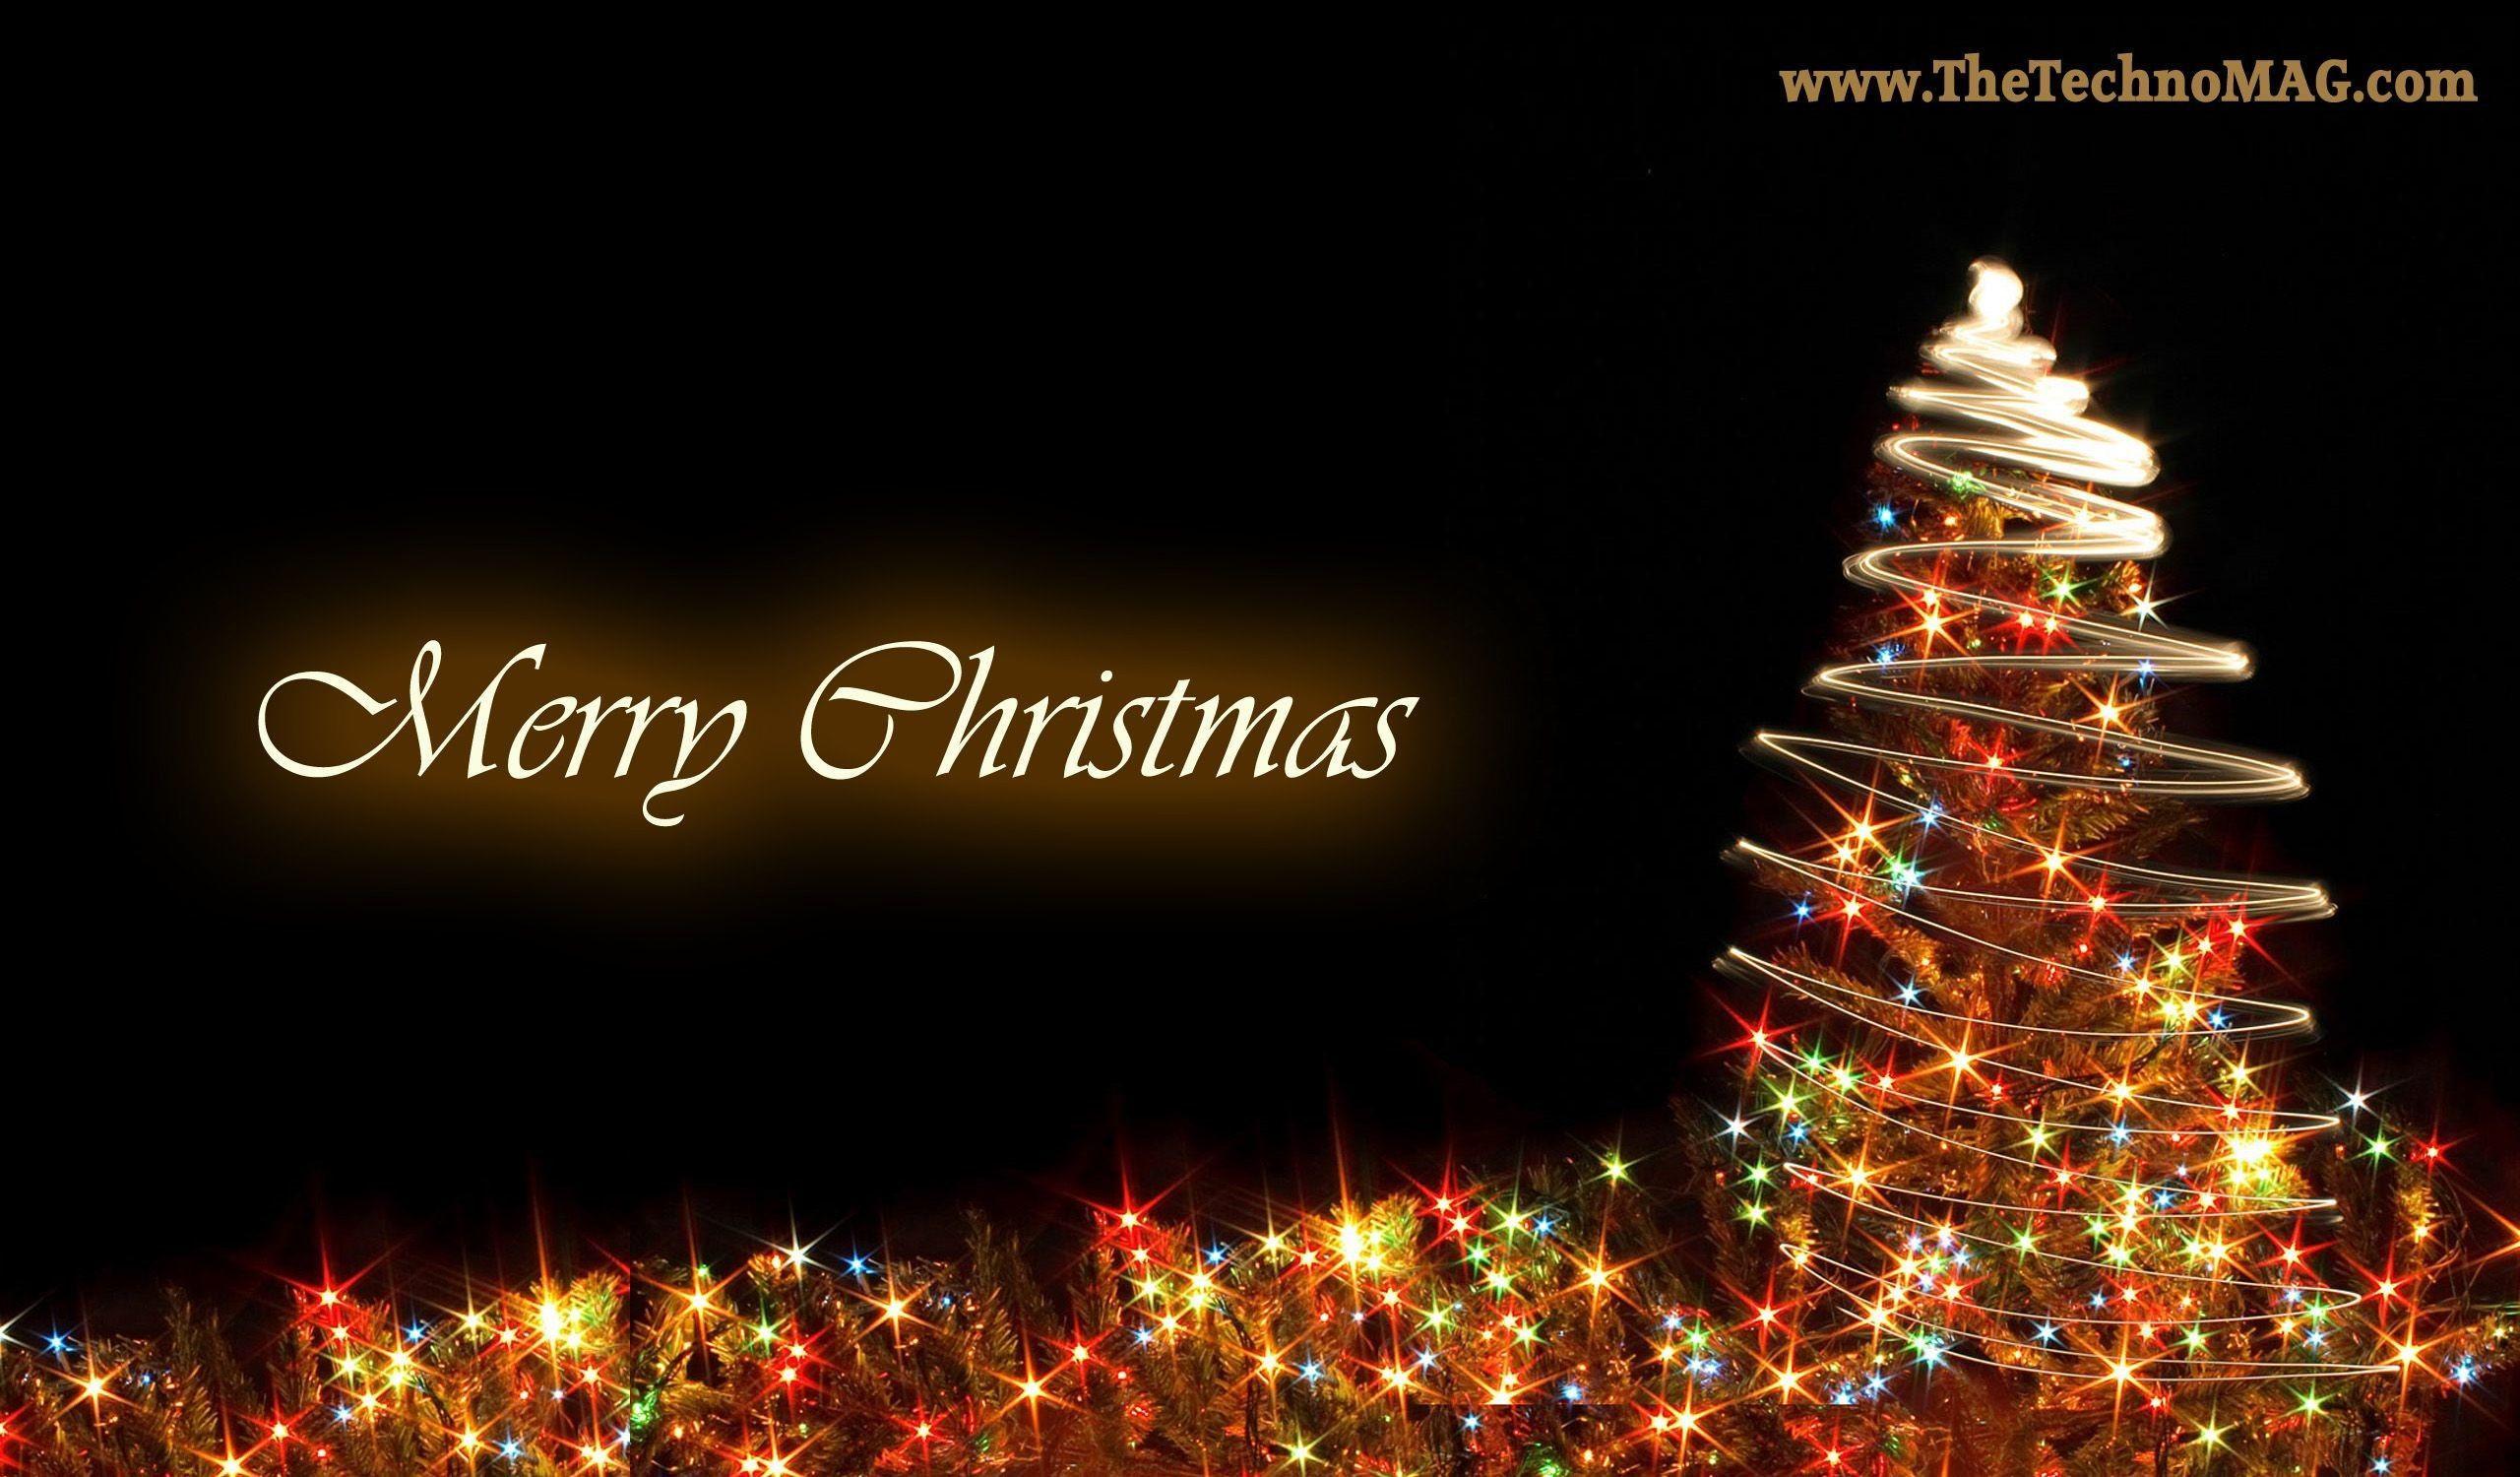 Christmas Desktop Wallpapers Top Free Christmas Desktop Backgrounds Wallpaperaccess